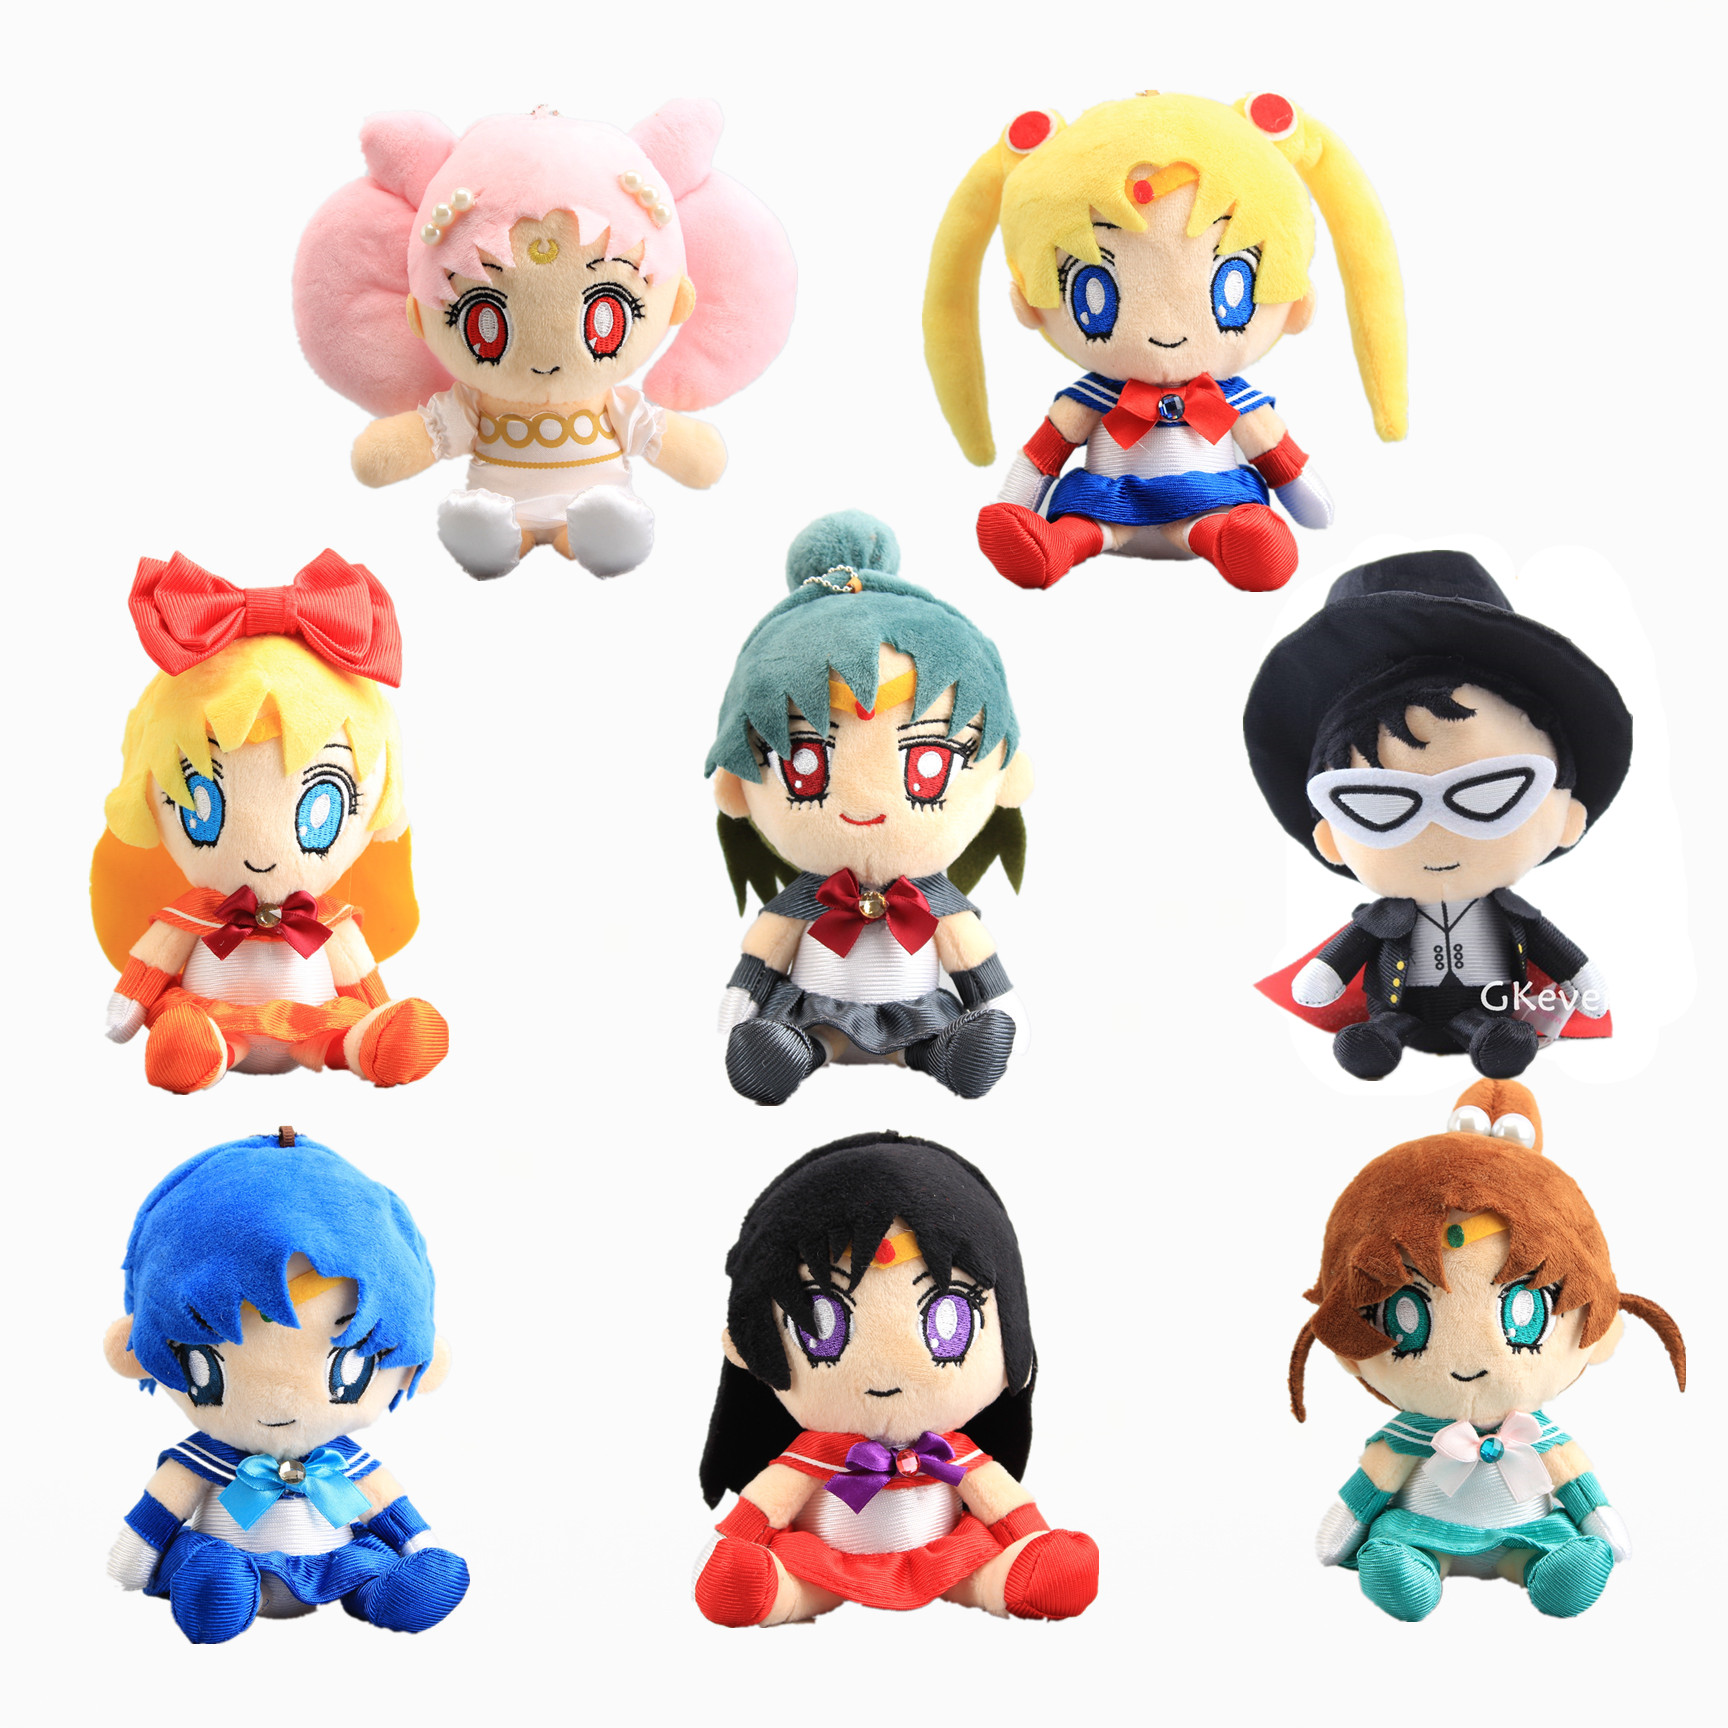 17-20 Cm Sailor Moon Tsukino Usagi Chibi Usa Sailor Mars Jupiter Mercury Venus Pluto Plush Stuffed Toys Doll Peluche Kids Gift